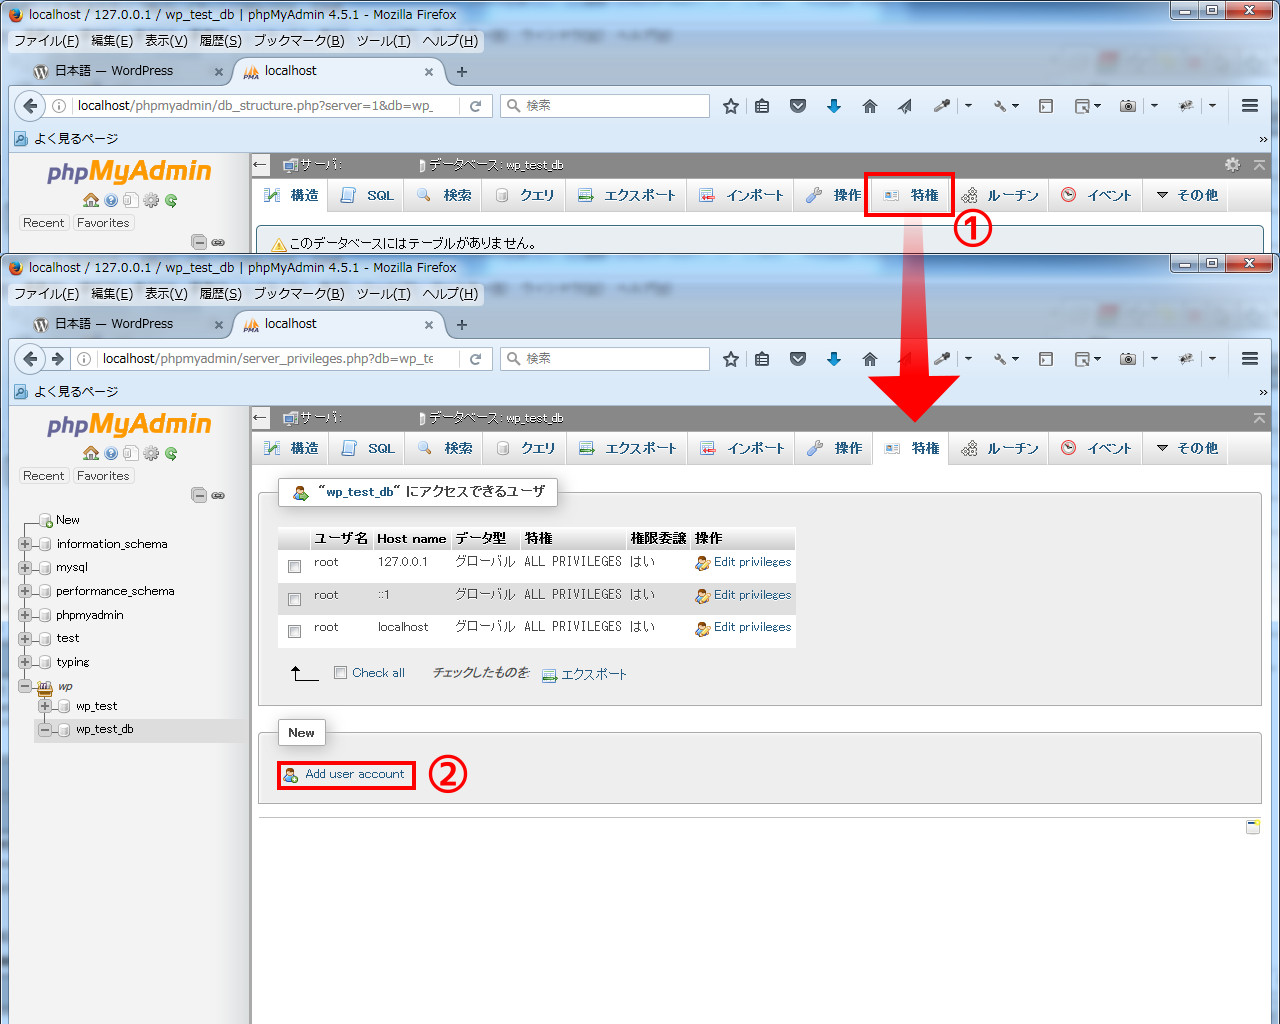 phpMyAdminでユーザーを作成